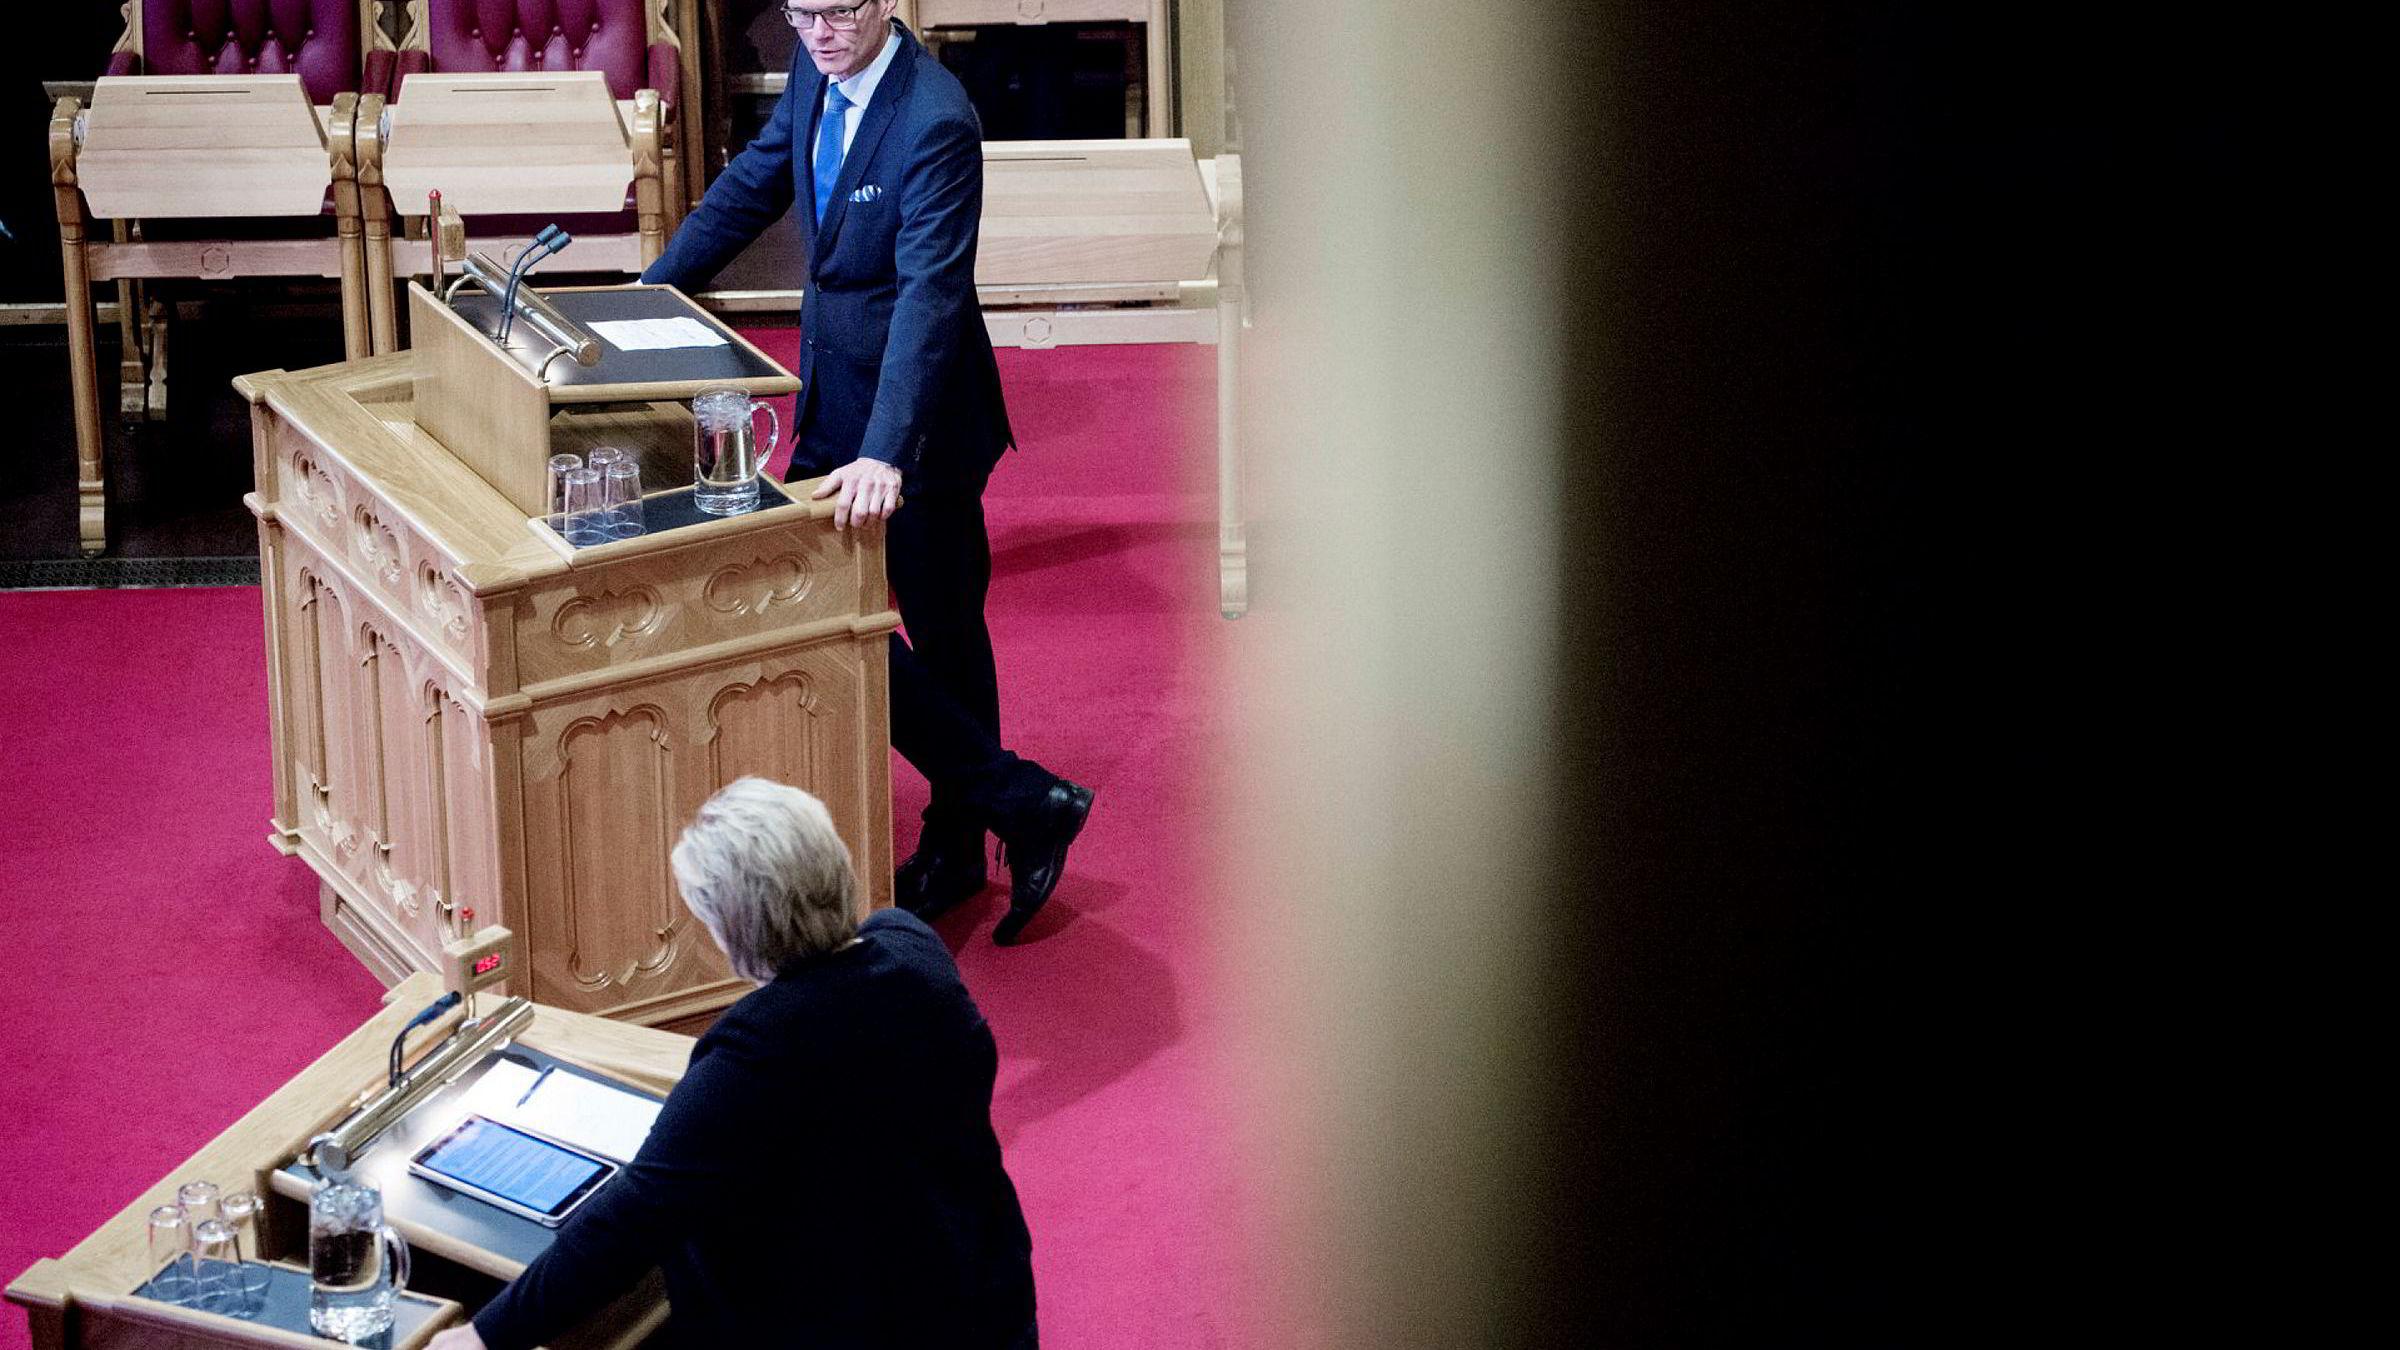 Finanspolitisk talsmann Terje Breivik i Venstre, foreslår at Oljefondet slutter med aksjeplukking og satser på passiv forvaltning av oljeformuen.